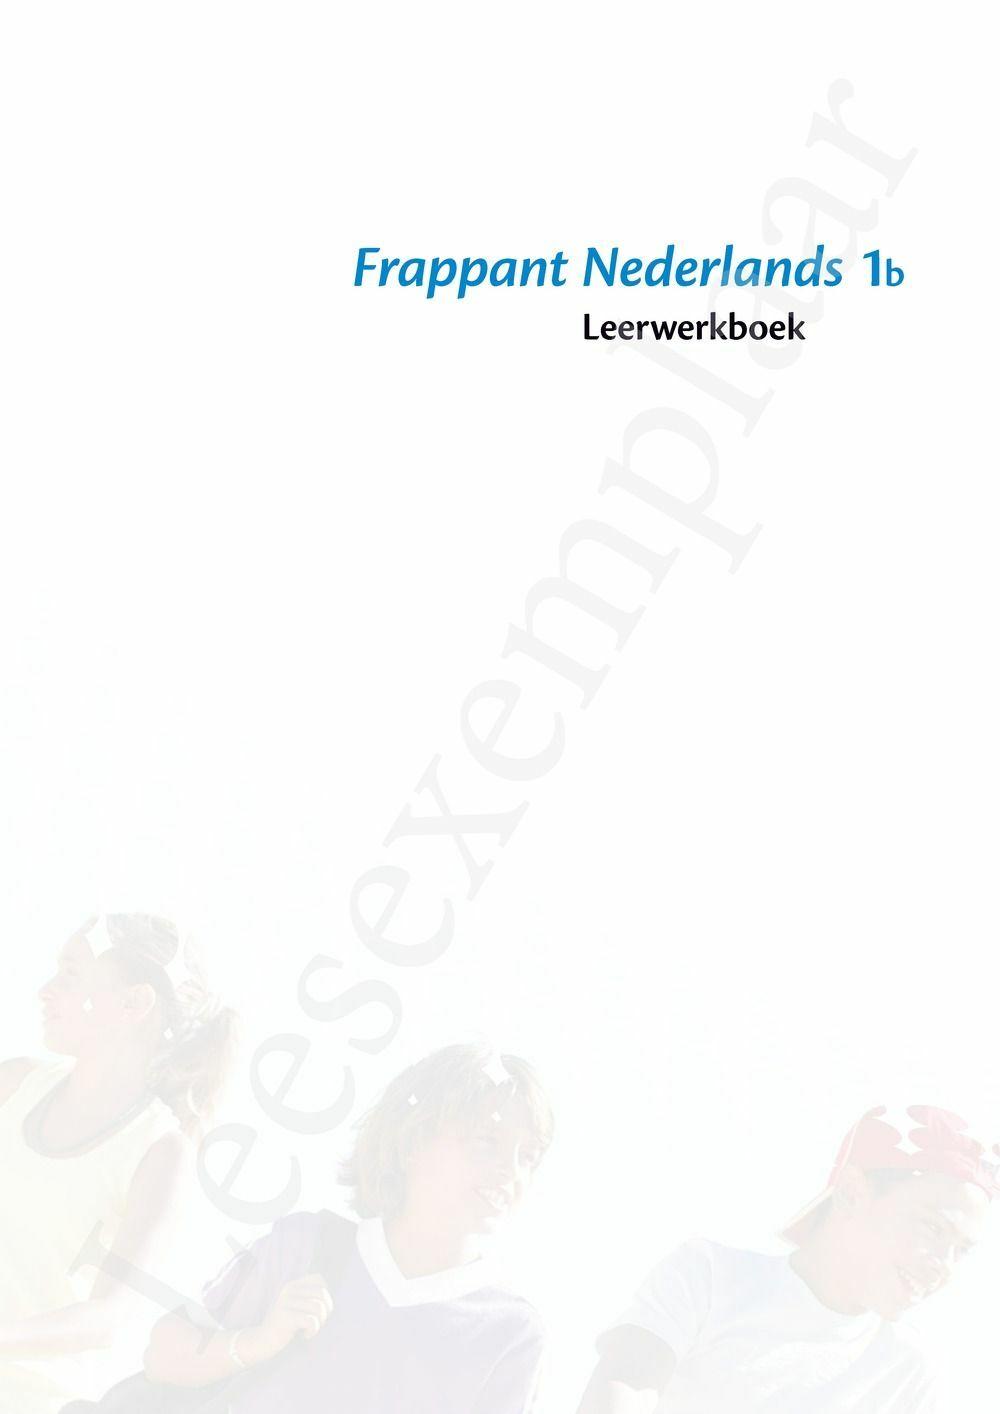 Preview: Frappant Nederlands 1b leerwerkboek (editie 2019) (inclusief Pelckmans Portaal)